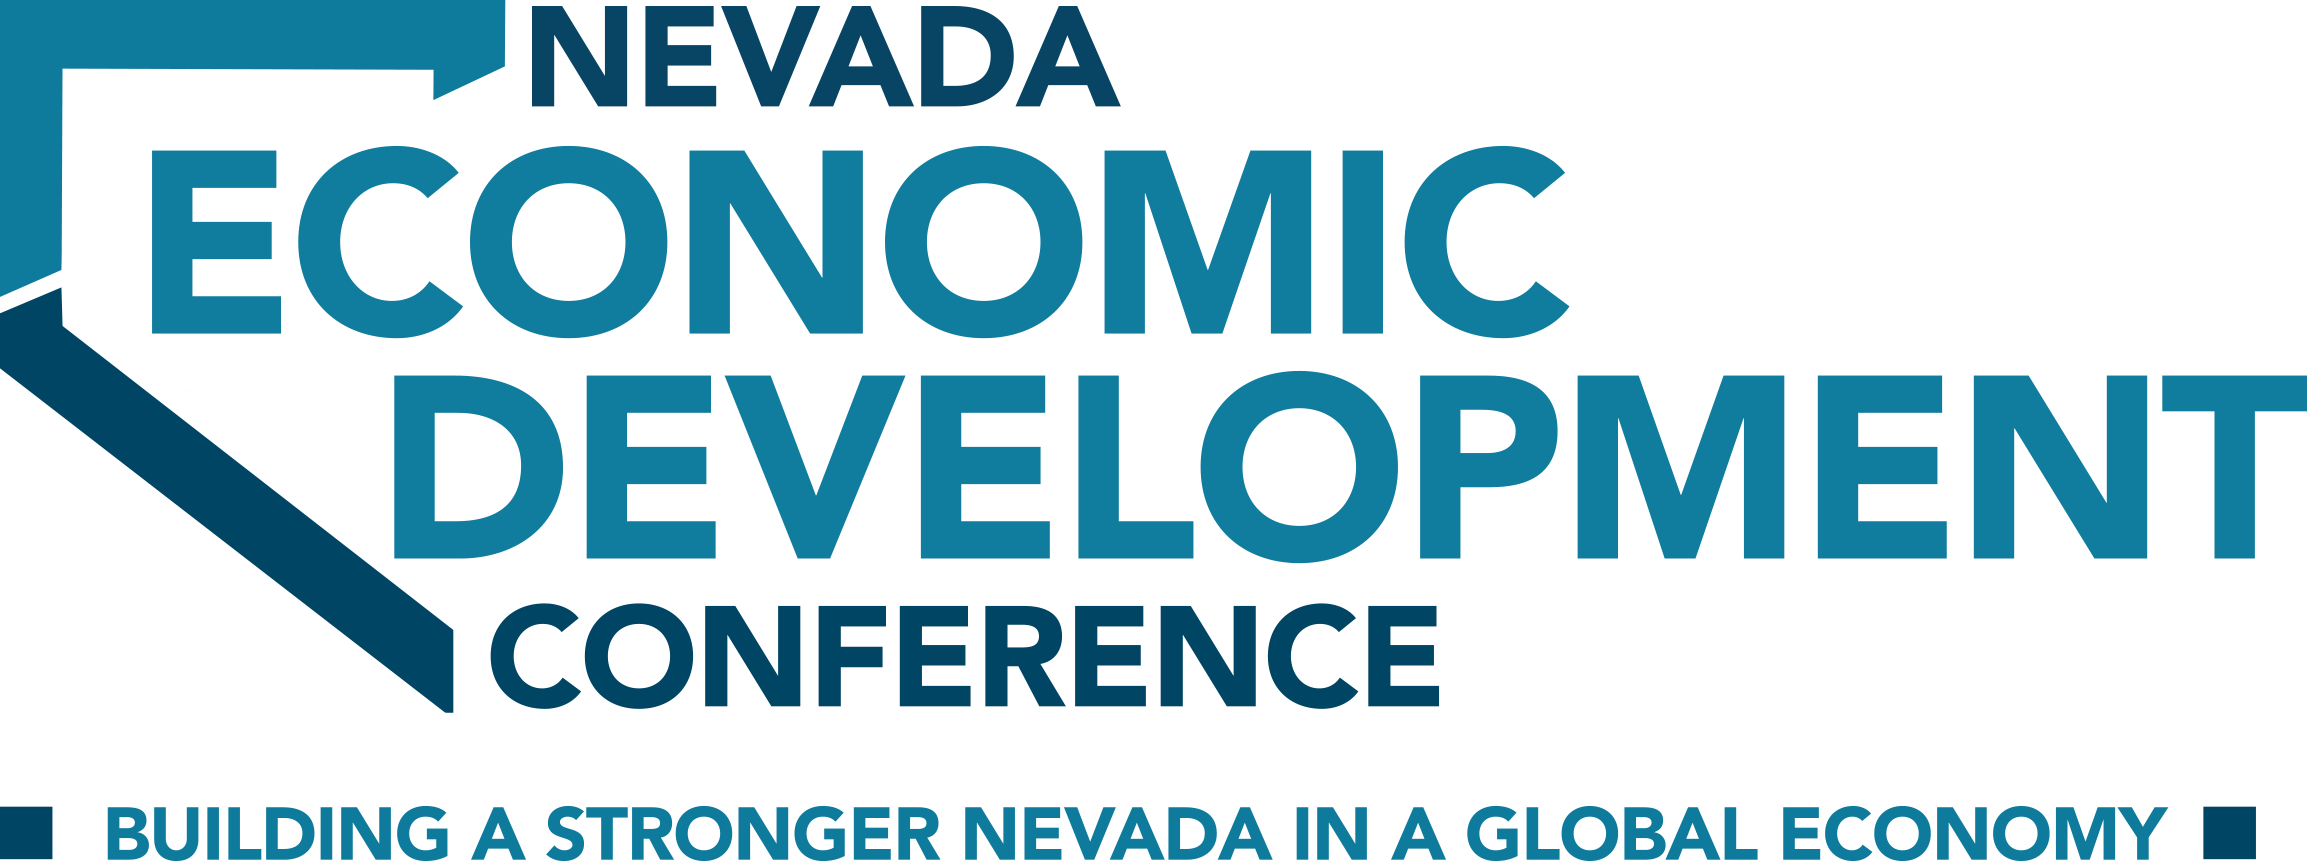 Nevada Economic Development Conference 2017